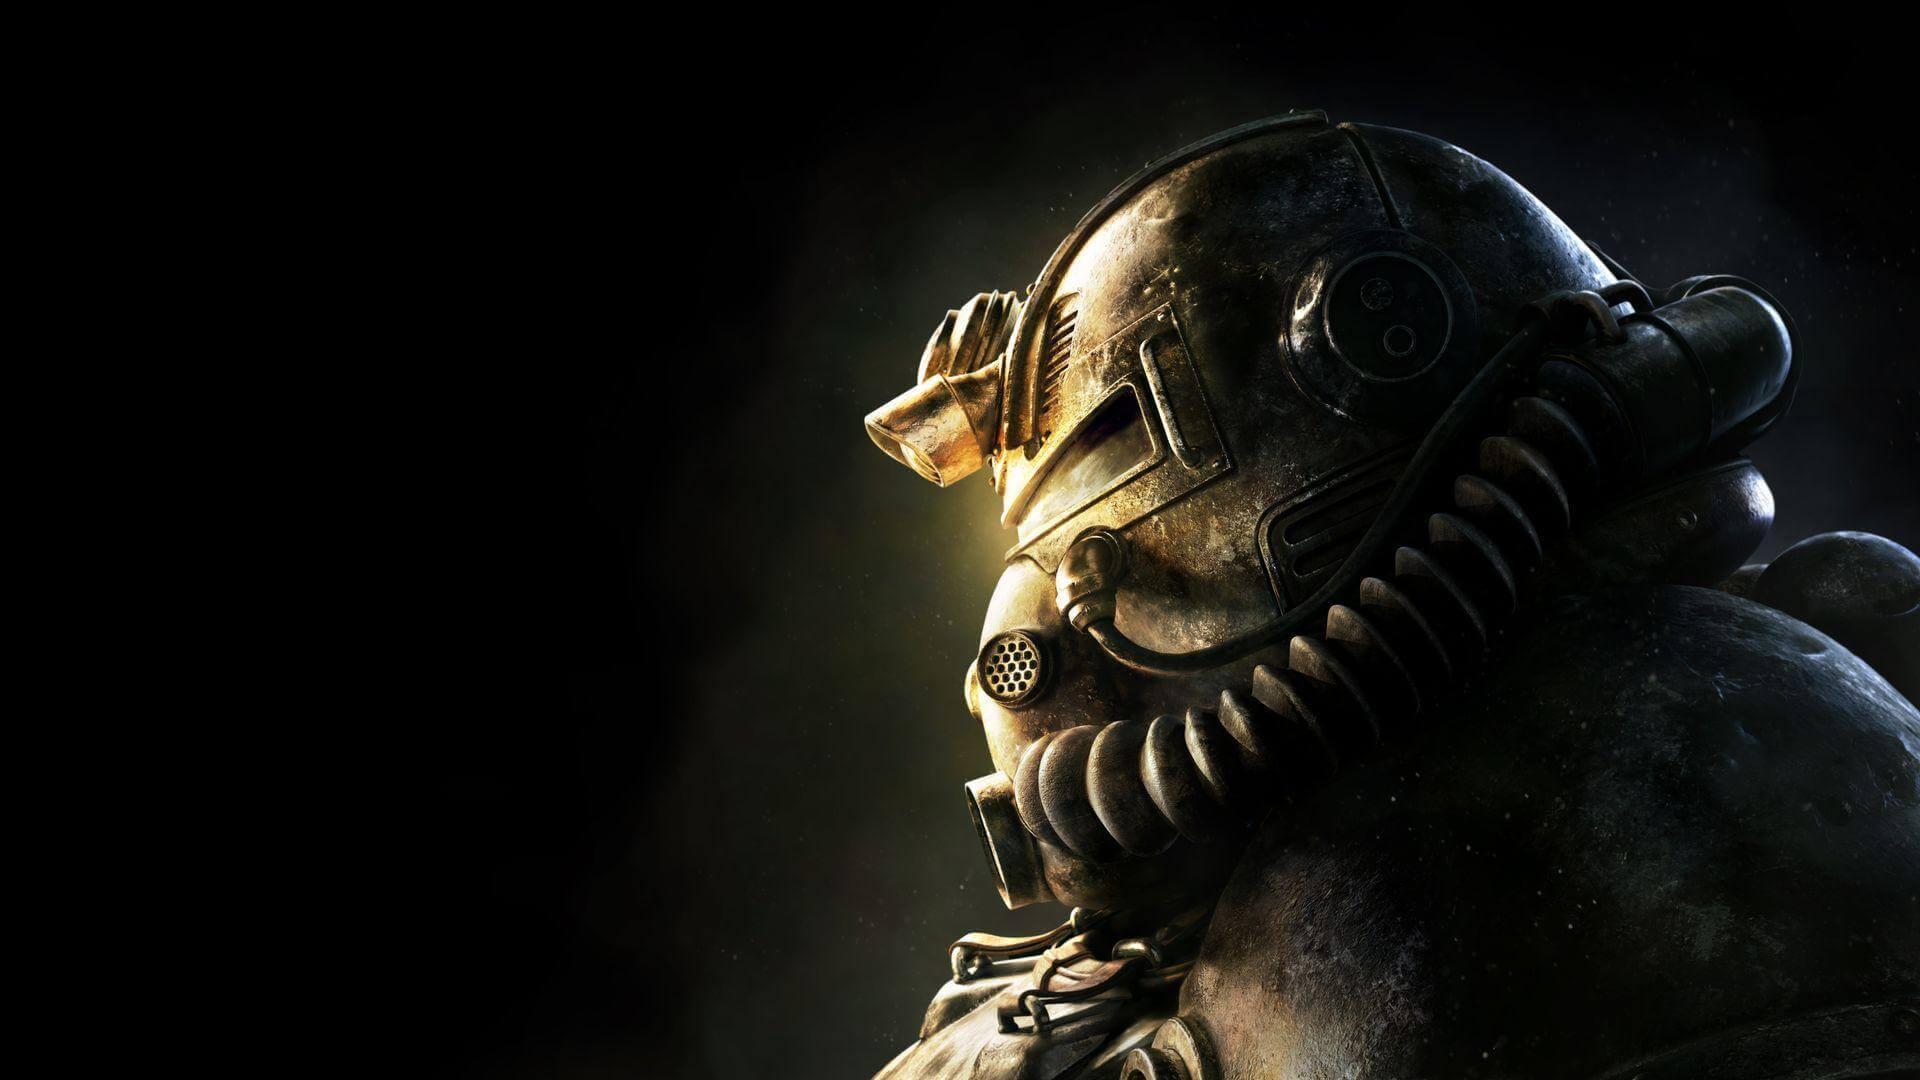 Bethesda Fallout 76 Cover Art